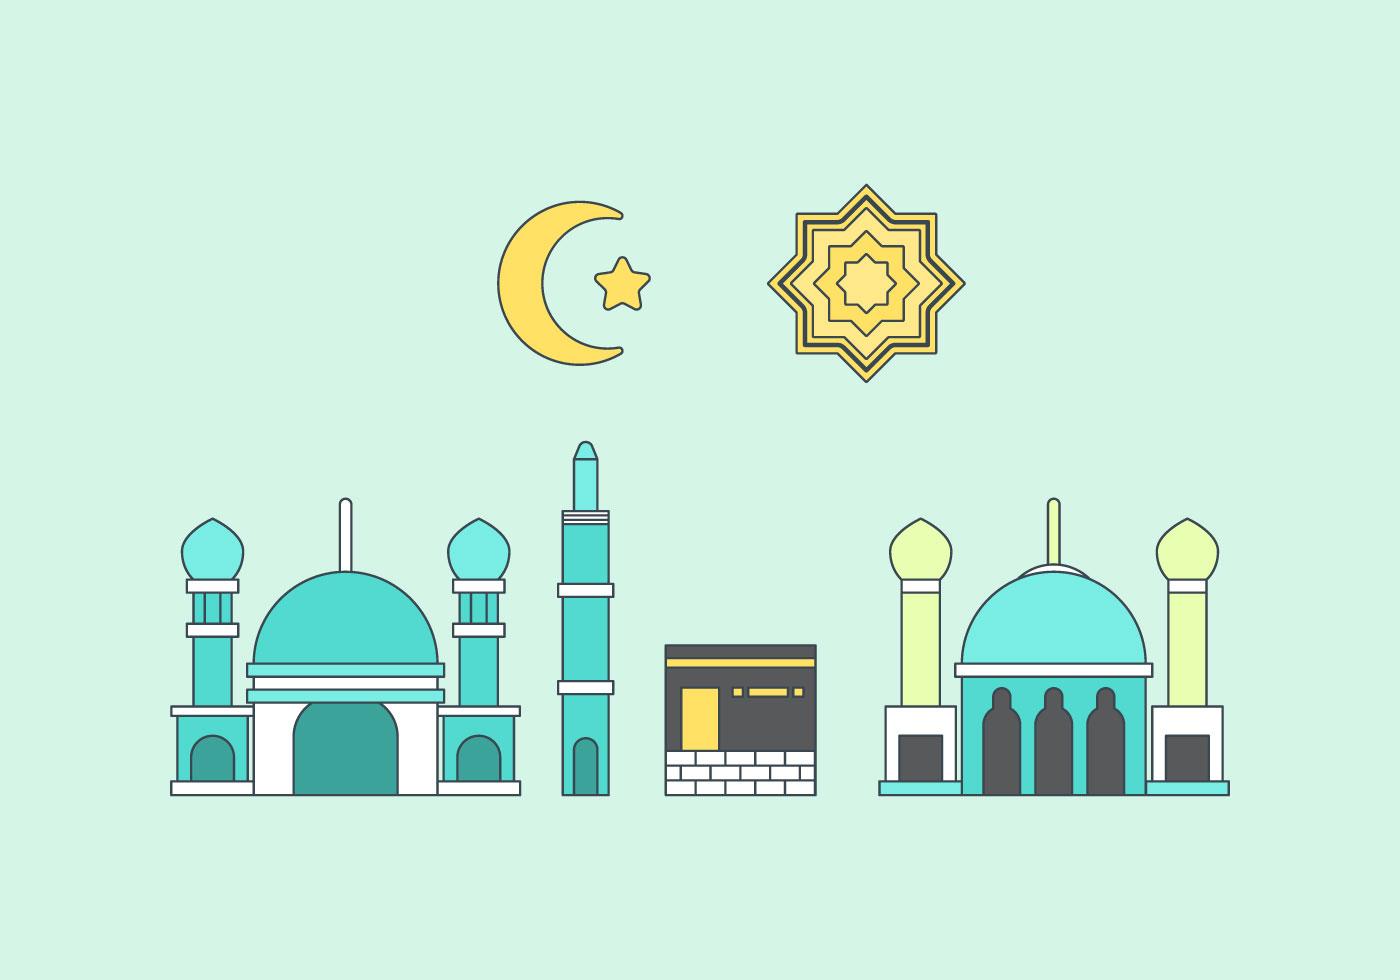 makkah vector illustration 1 download free vector art